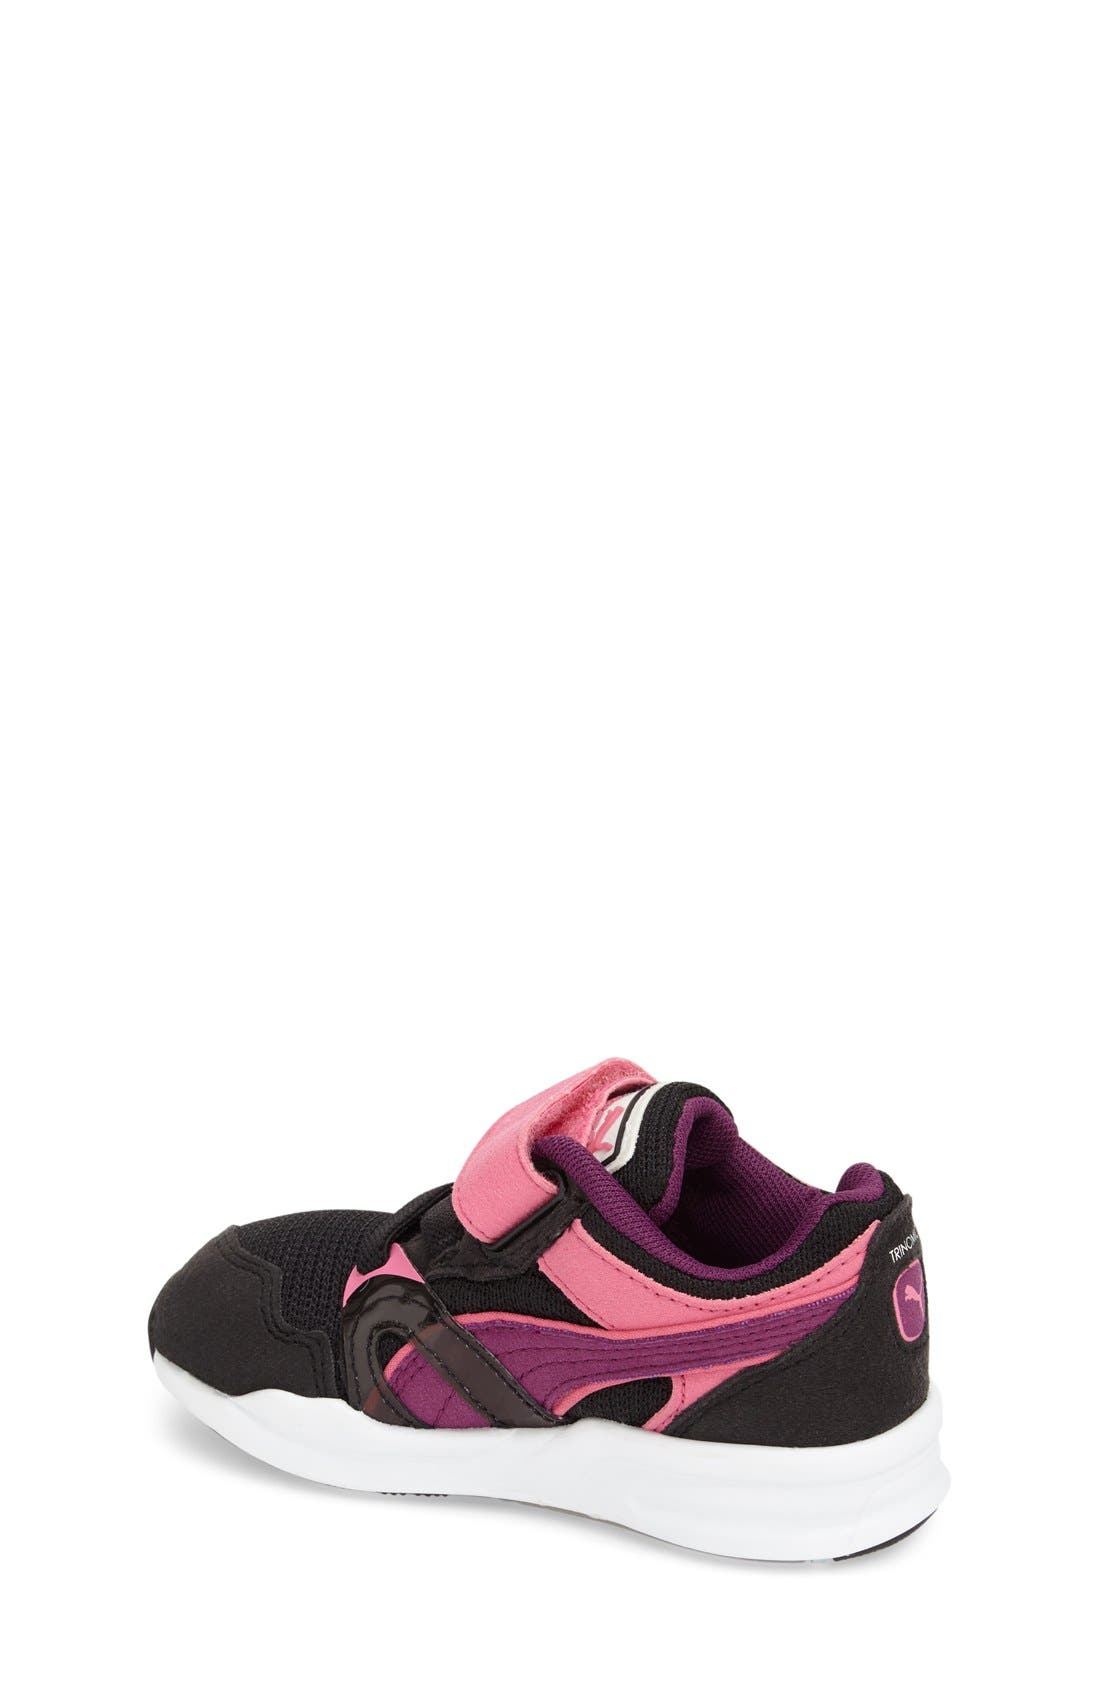 Alternate Image 2  - PUMA 'Trinomic XT1 Plus V' Sneaker (Baby, Walker, Toddler, Little Kid & Big Kid)